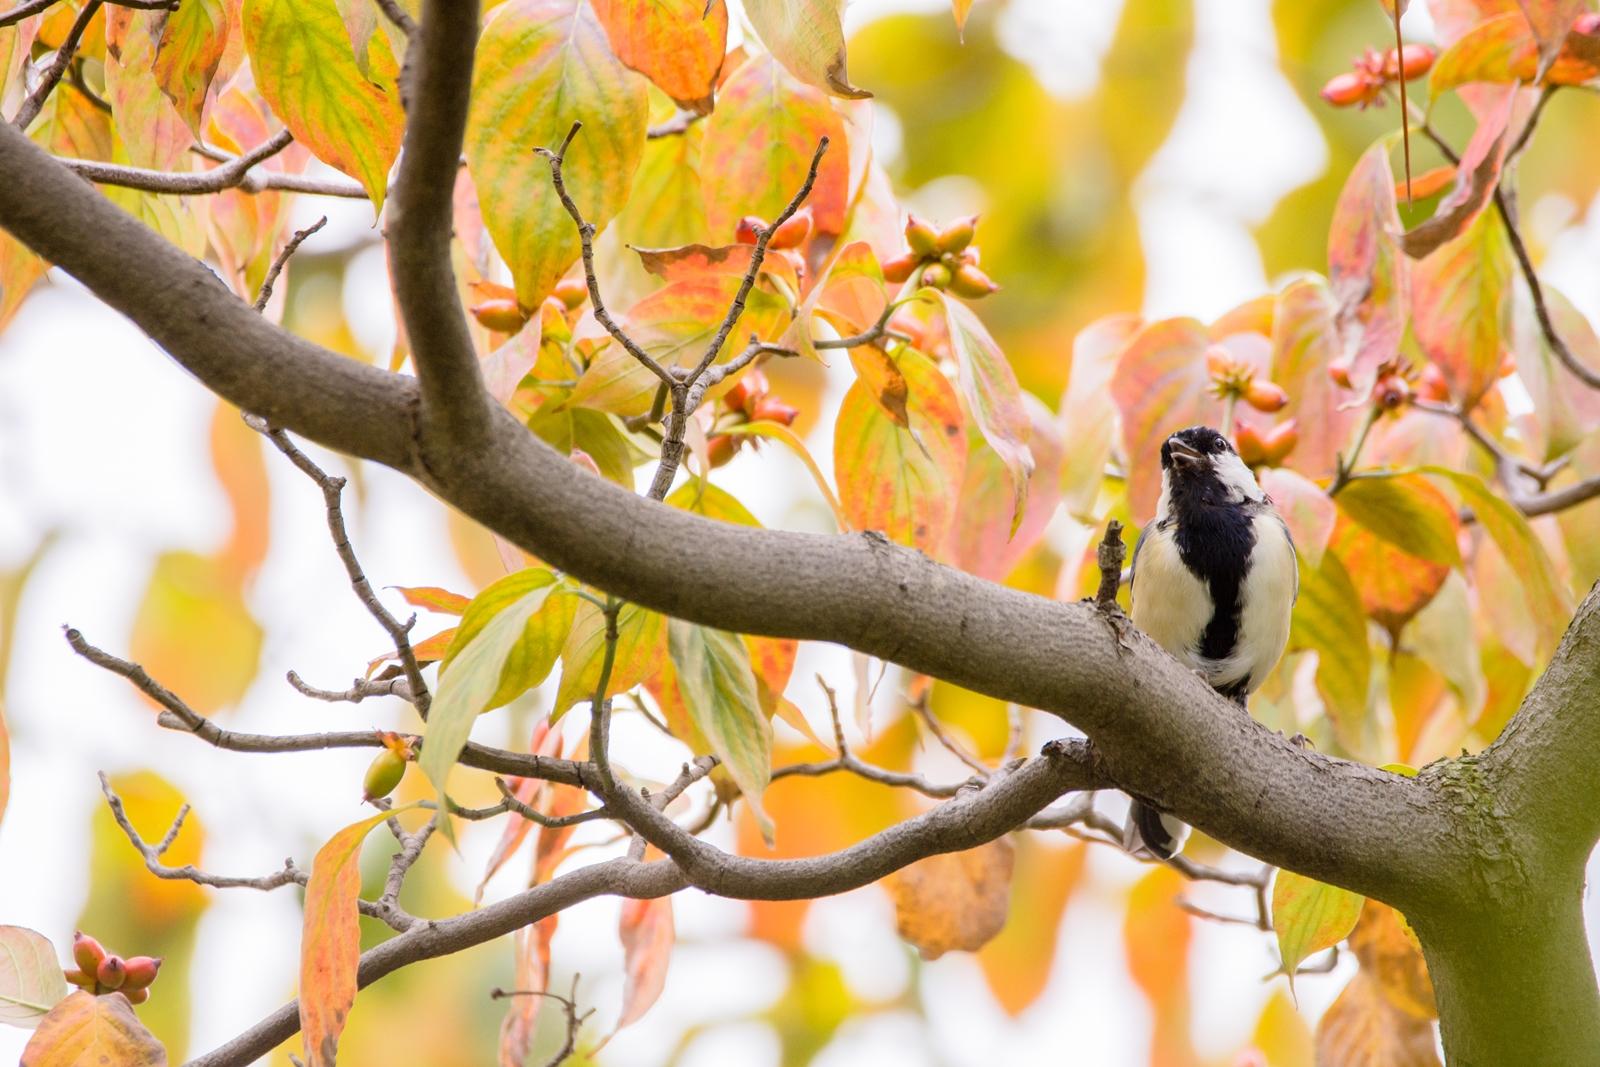 Photo: 実りに喜び歌う Sing a joy of fruitful.  とても嬉しい季節 歌いたくなる 木々が実を付け 気持ちが高鳴る  Japanese Tit. (シジュウカラ)  #birdphotography #birds #cooljapan #kawaii #nikon #sigma  Nikon D7200 SIGMA 150-600mm F5-6.3 DG OS HSM Contemporary